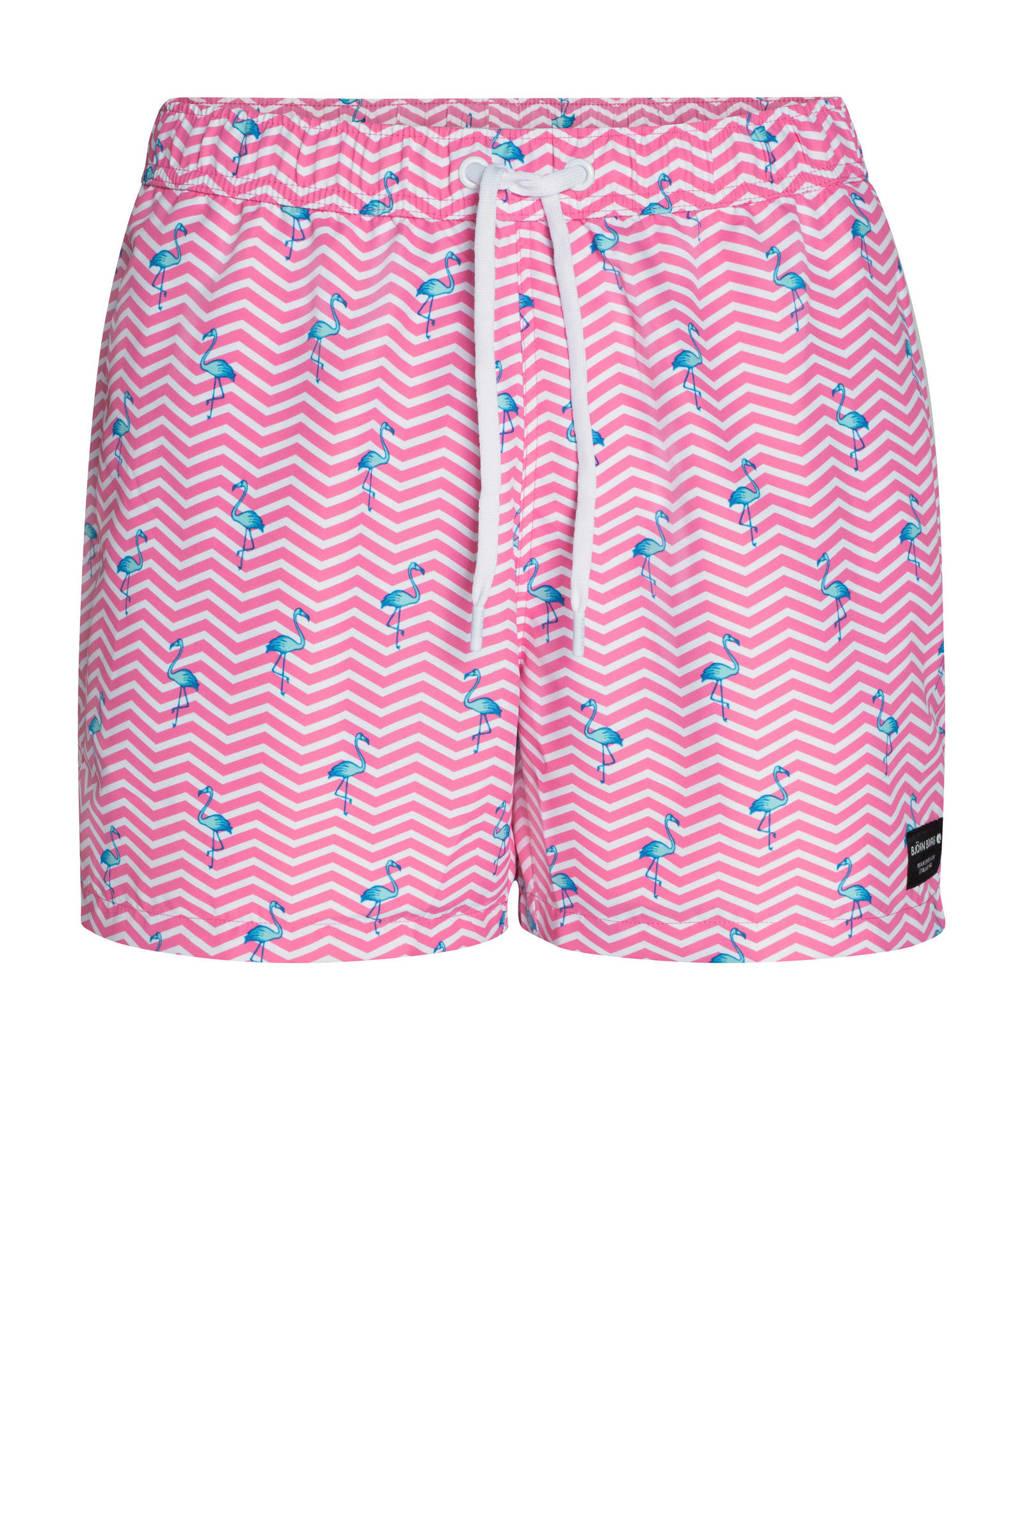 Björn Borg zwemshort met all over print roze, Roze/wit